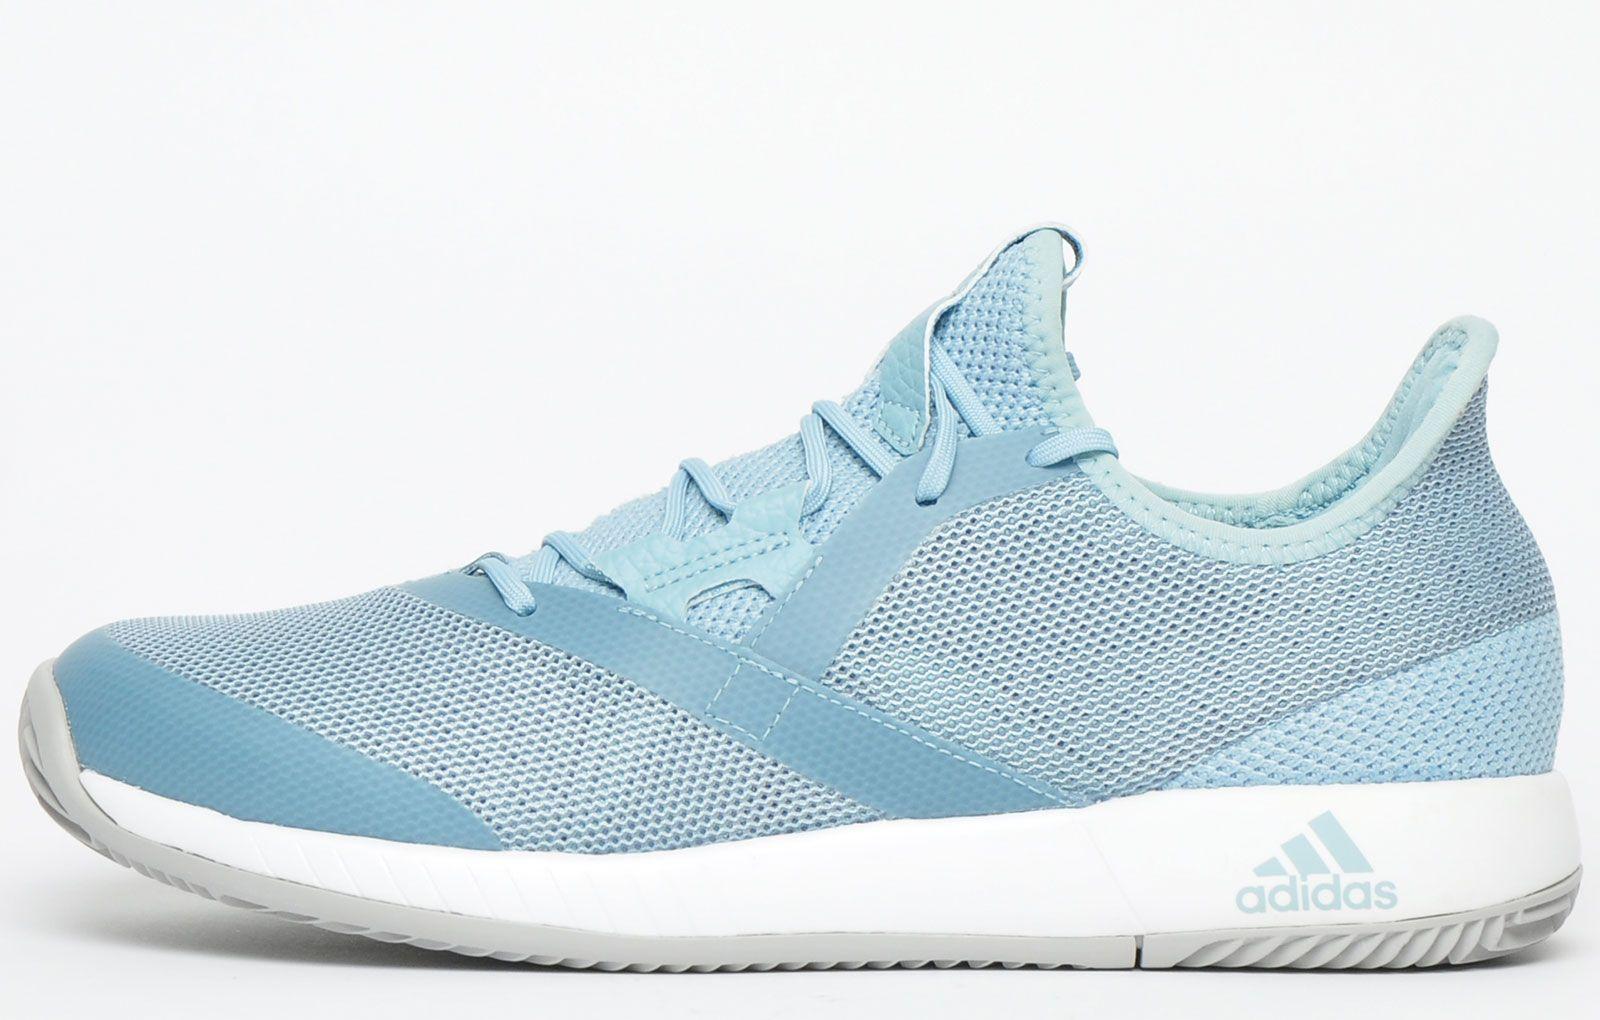 Adidas Adizero Defiant Bounce Mens